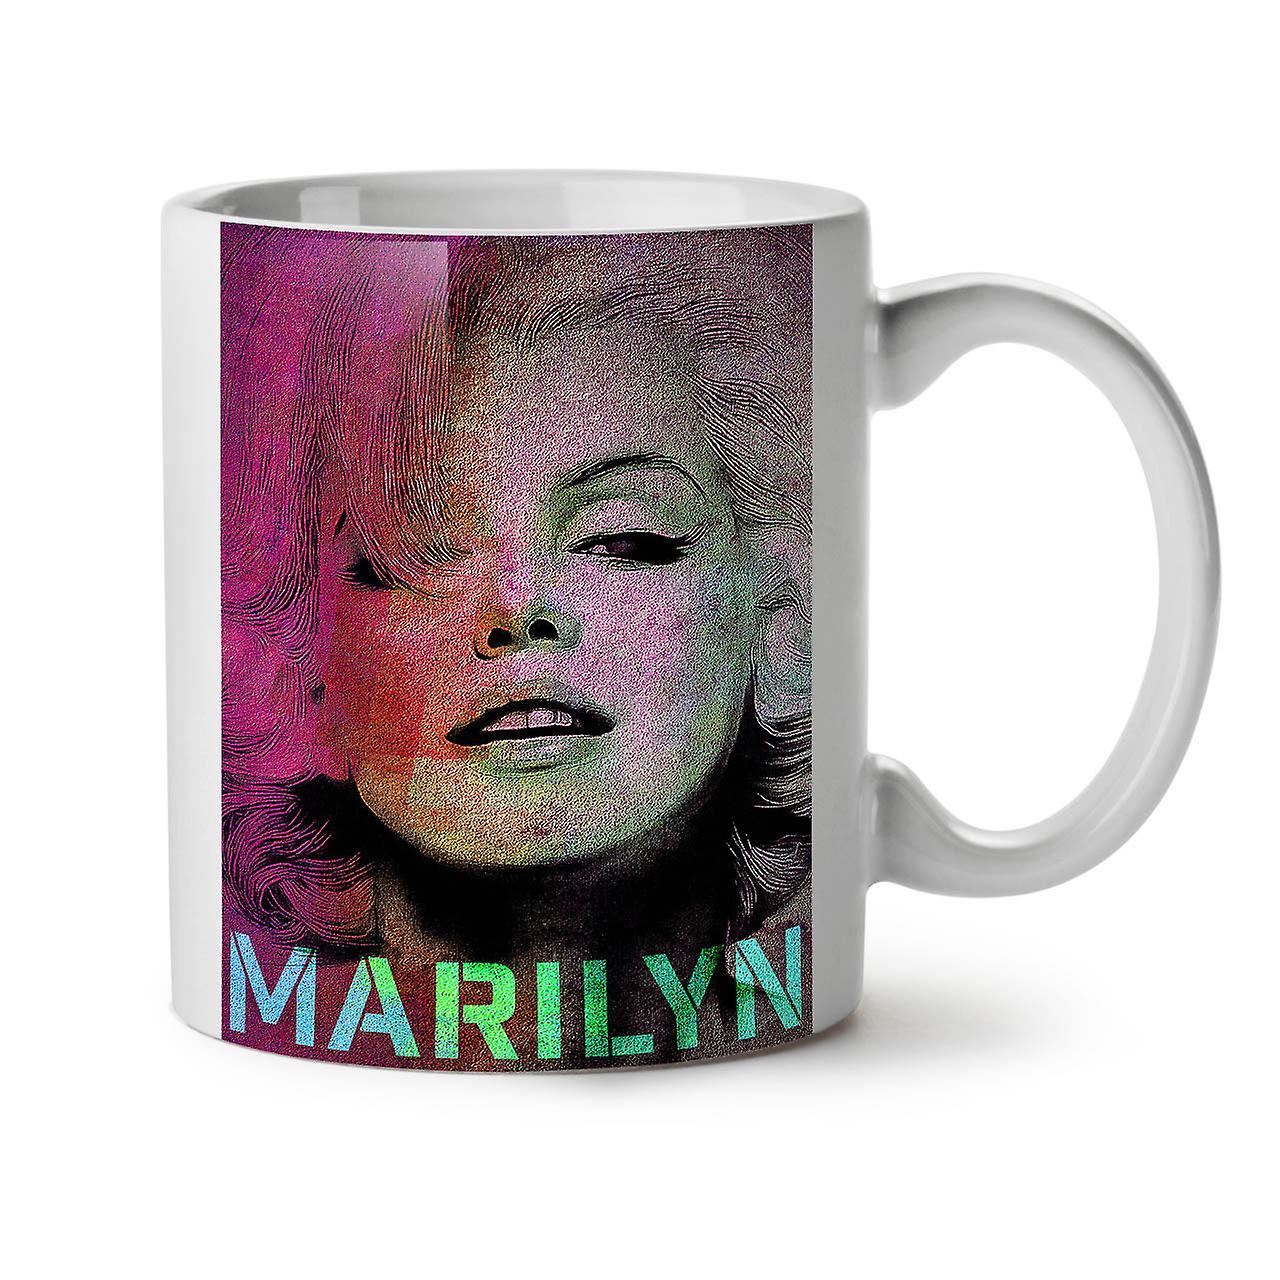 Tea White Mug Coffee Hot Marilyn New OzWellcoda Ceramic 11 vnN8mwO0